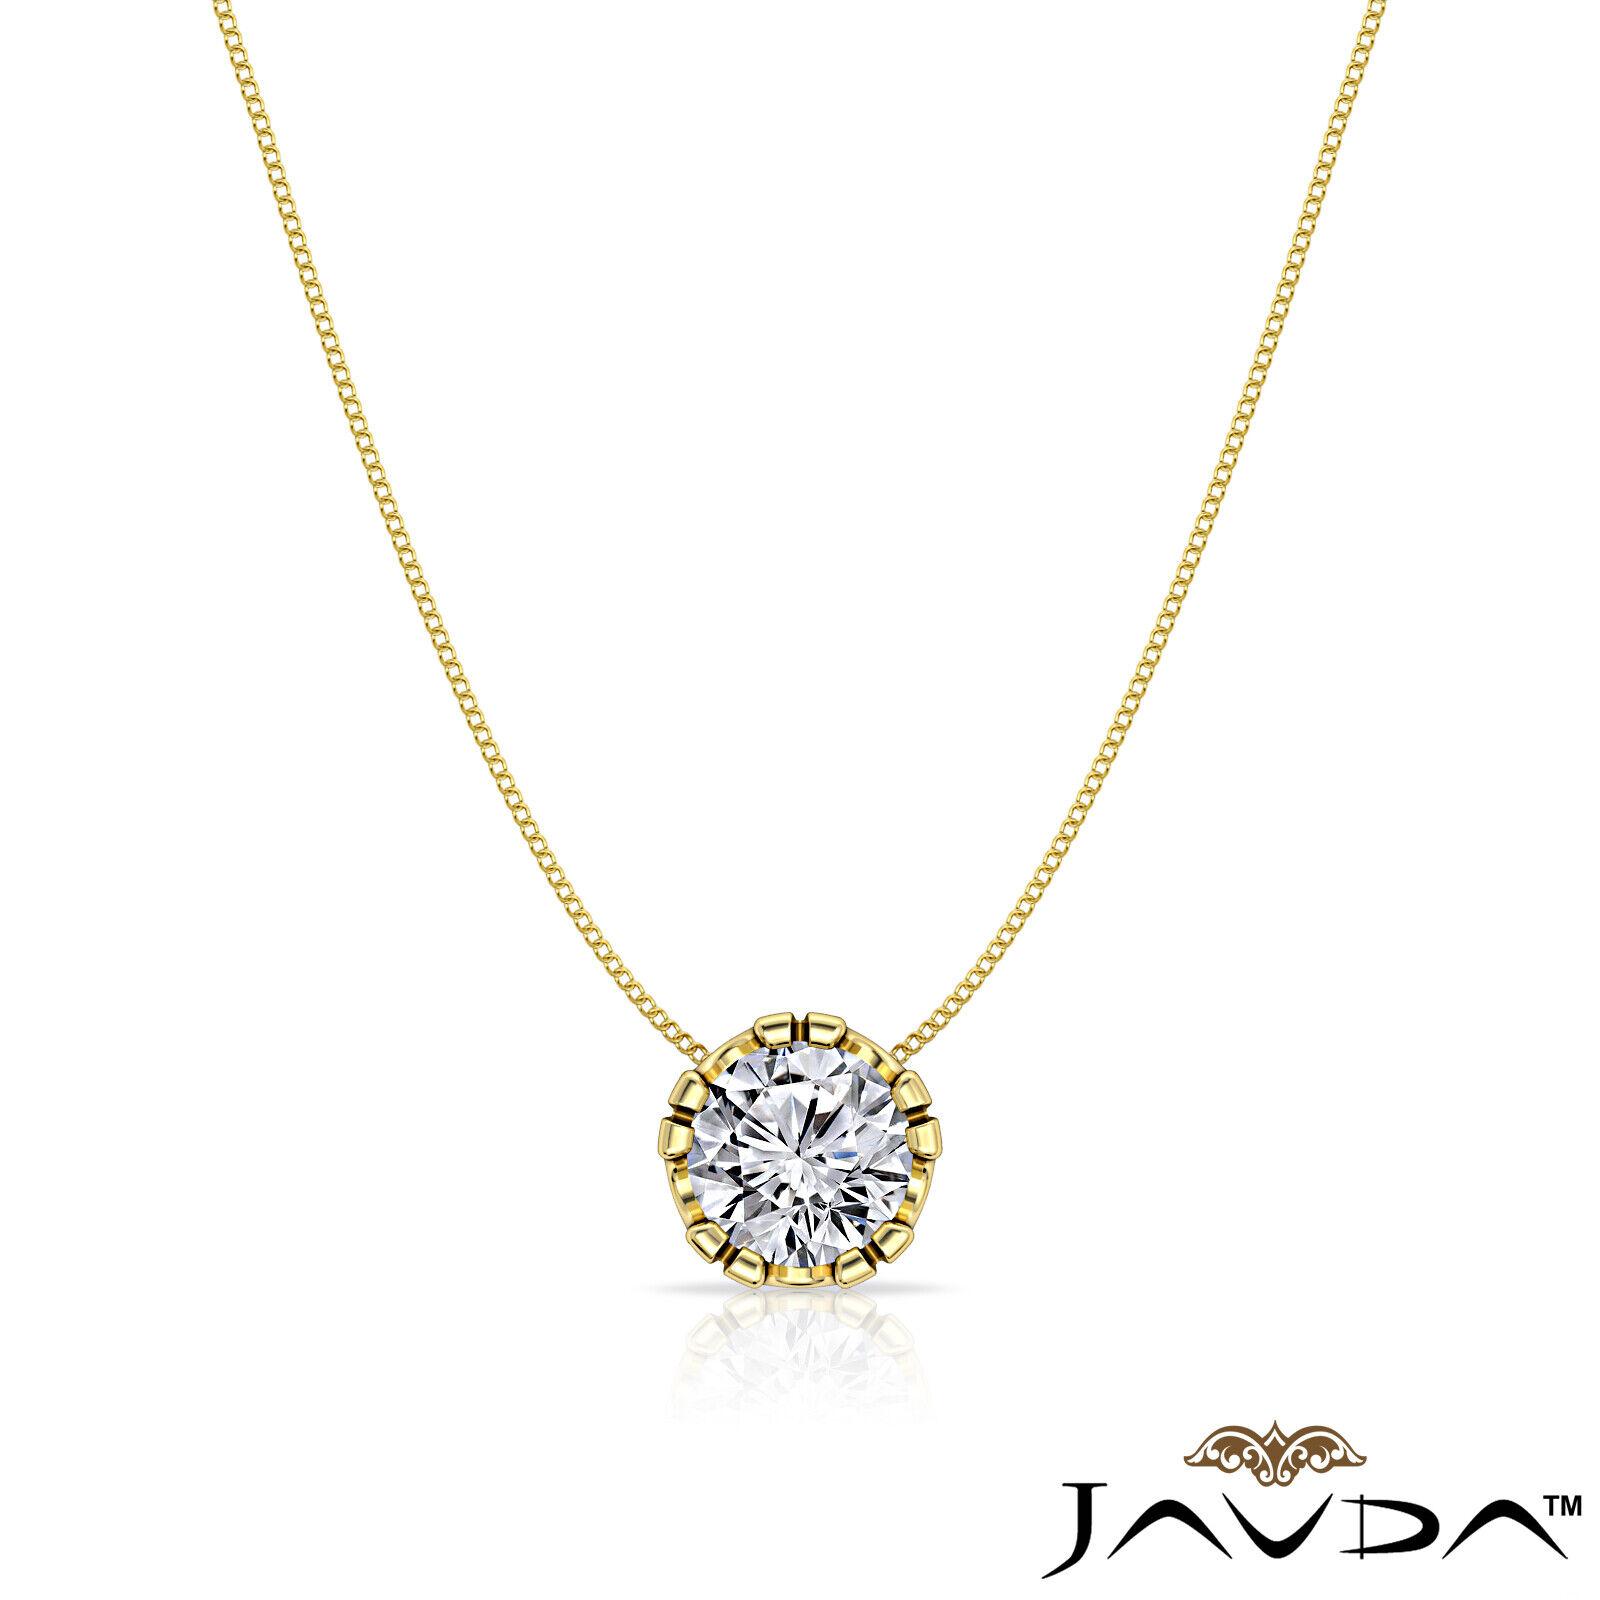 Solitaire Round Shape Diamond Double Prong Pendant 18 Inch Rolo Chain 0.26 ctw. 3